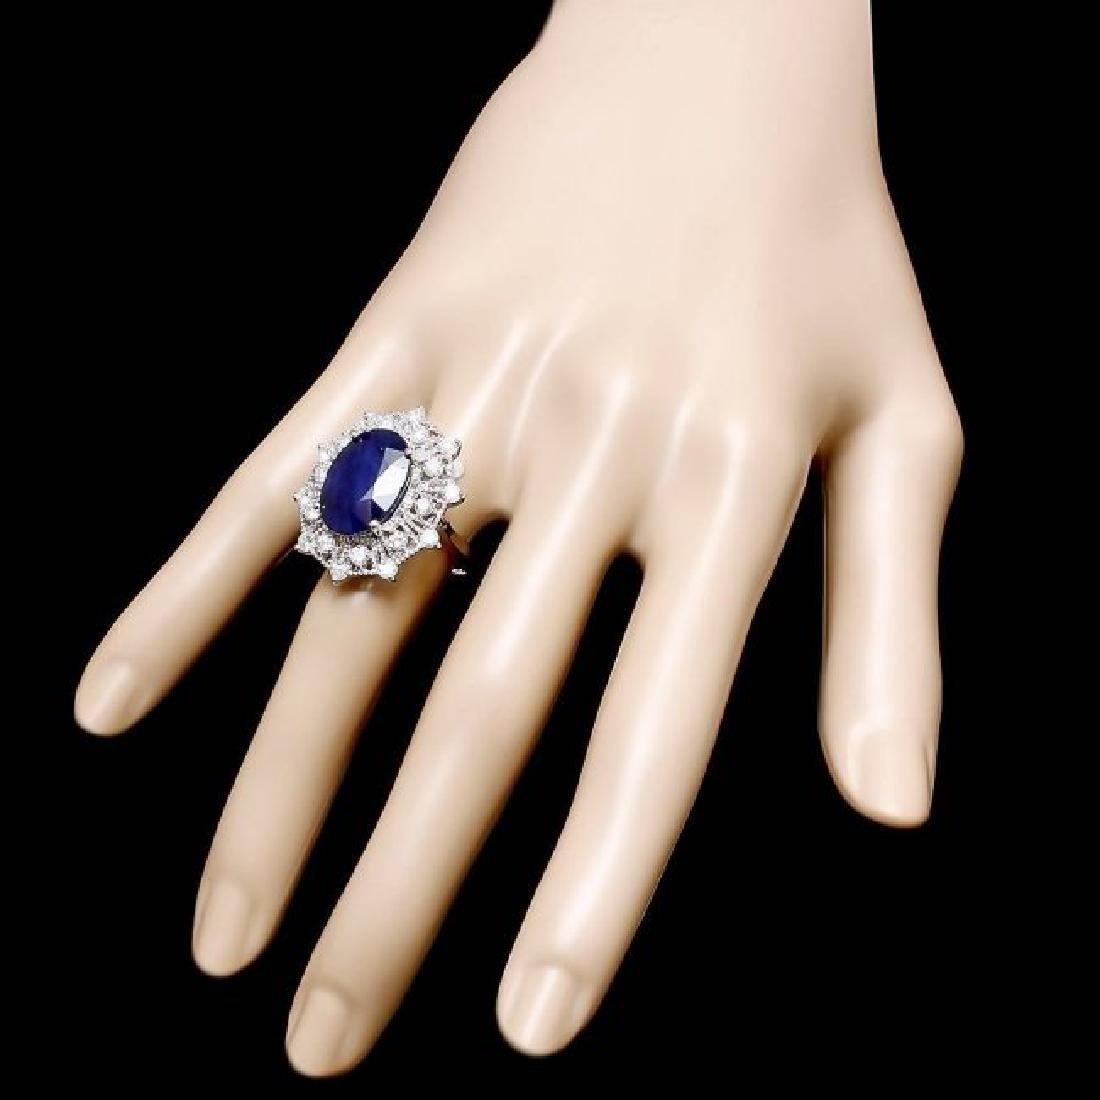 14k Gold 9.00ct Sapphire 1.35ct Diamond Ring - 3